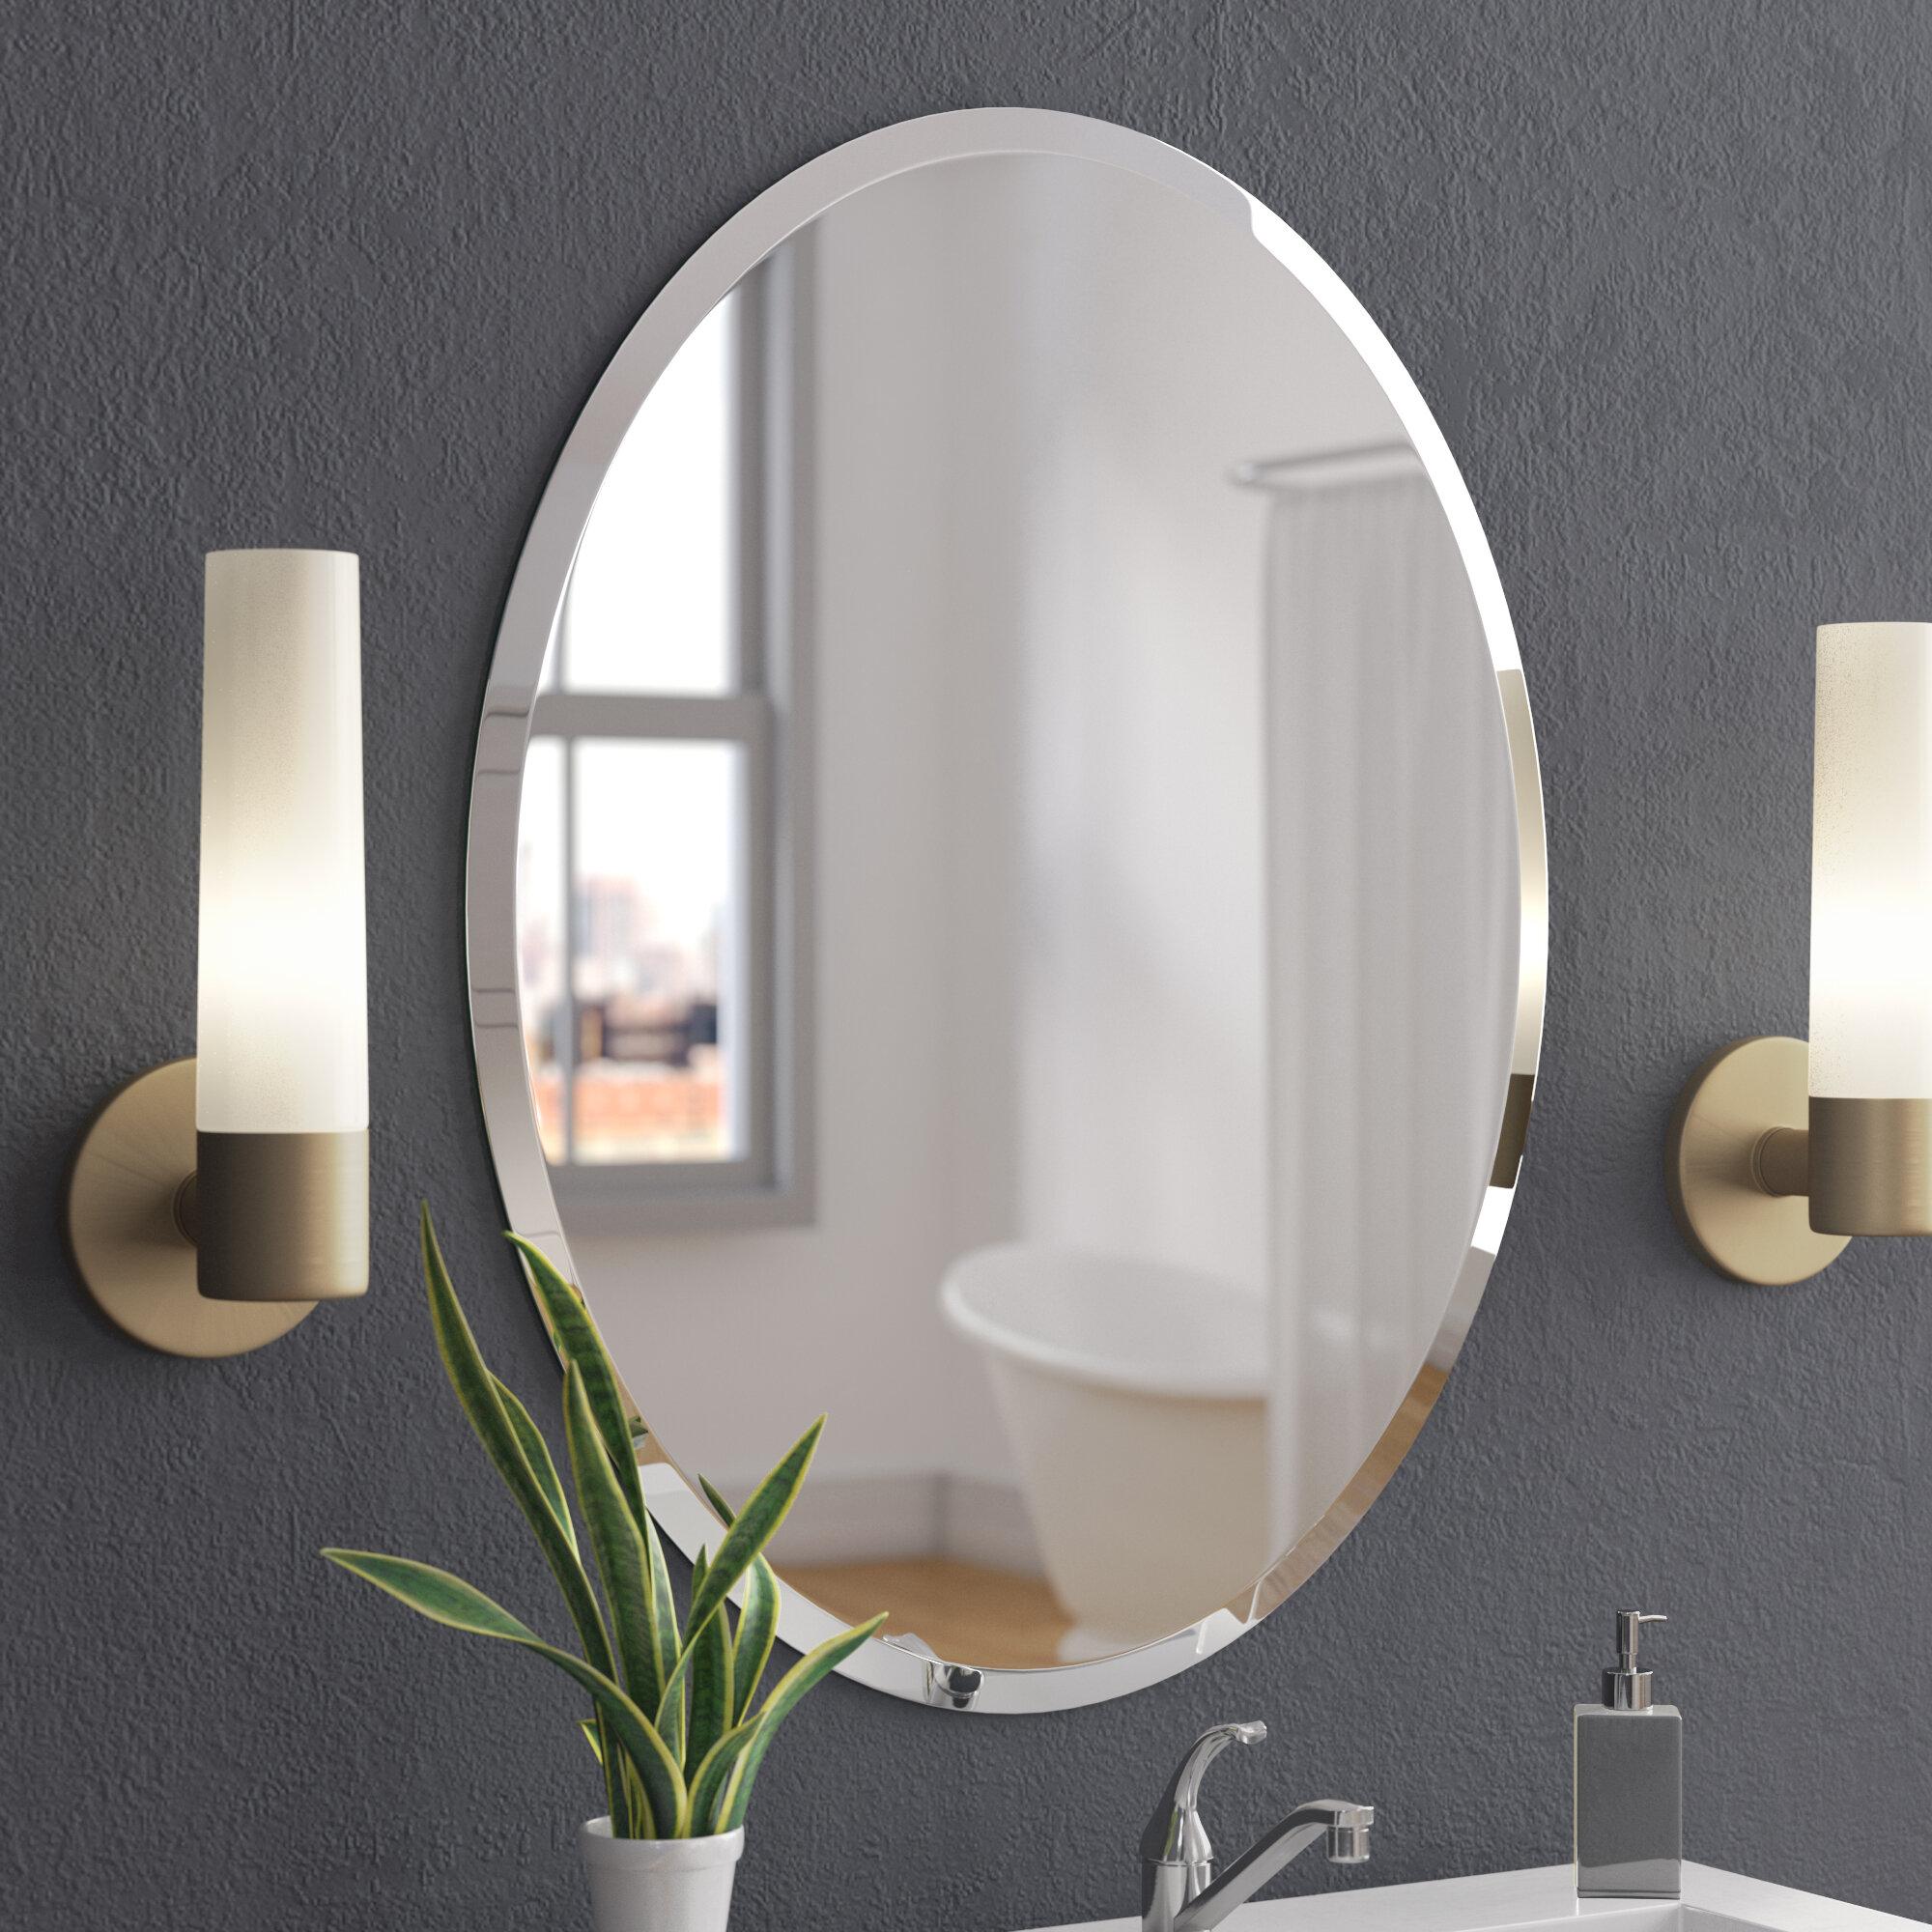 Horizontal Oval Vanity Mirrors You Ll Love In 2021 Wayfair